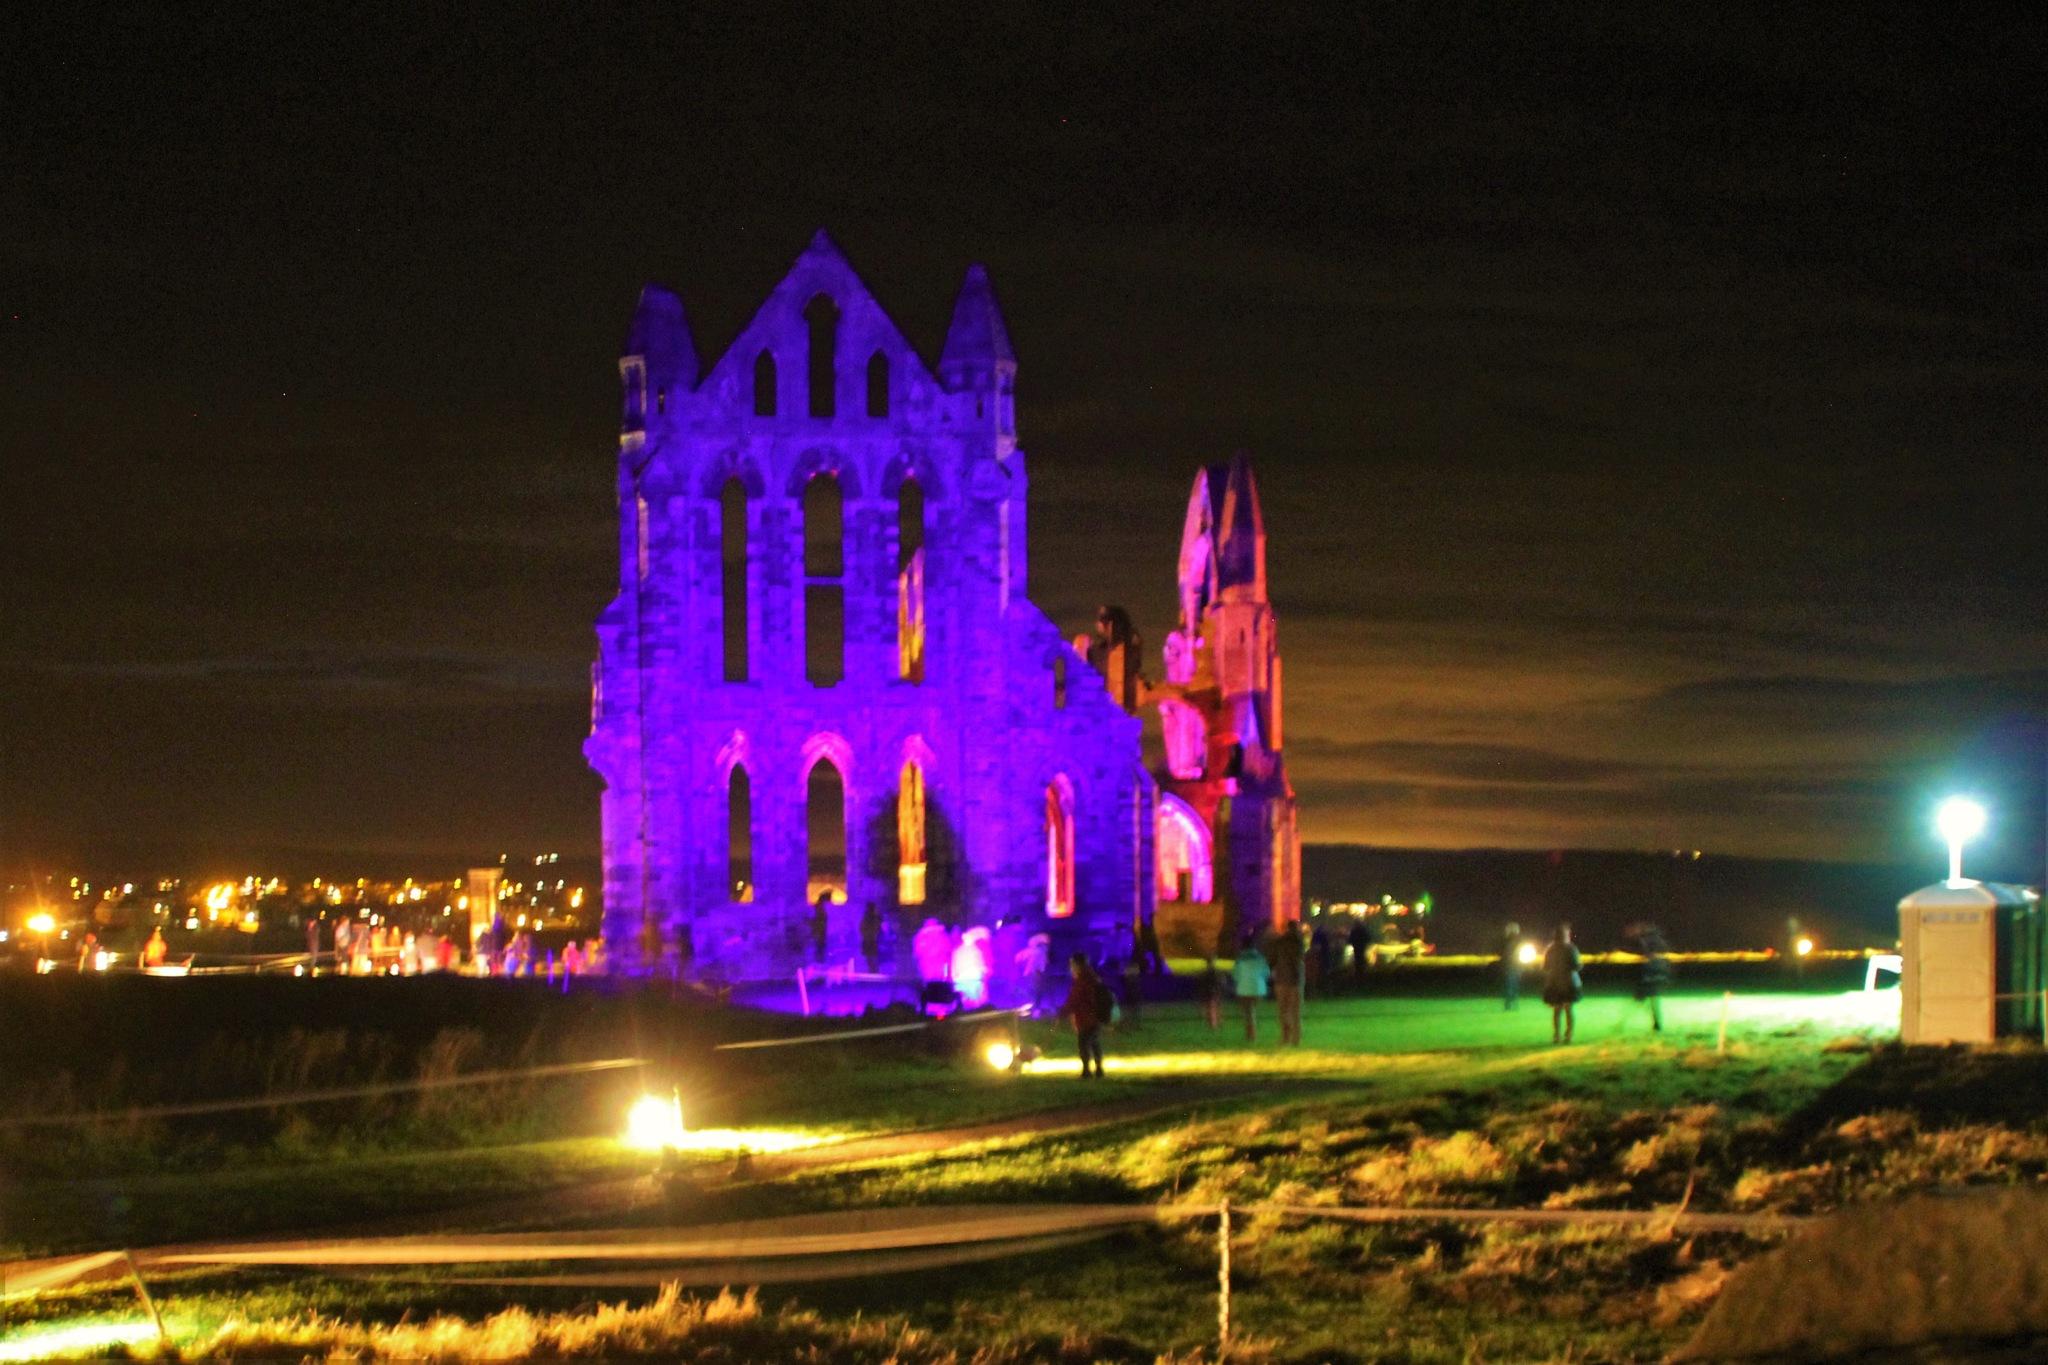 Whitby Abbey lit for Halloween by alijhawkins